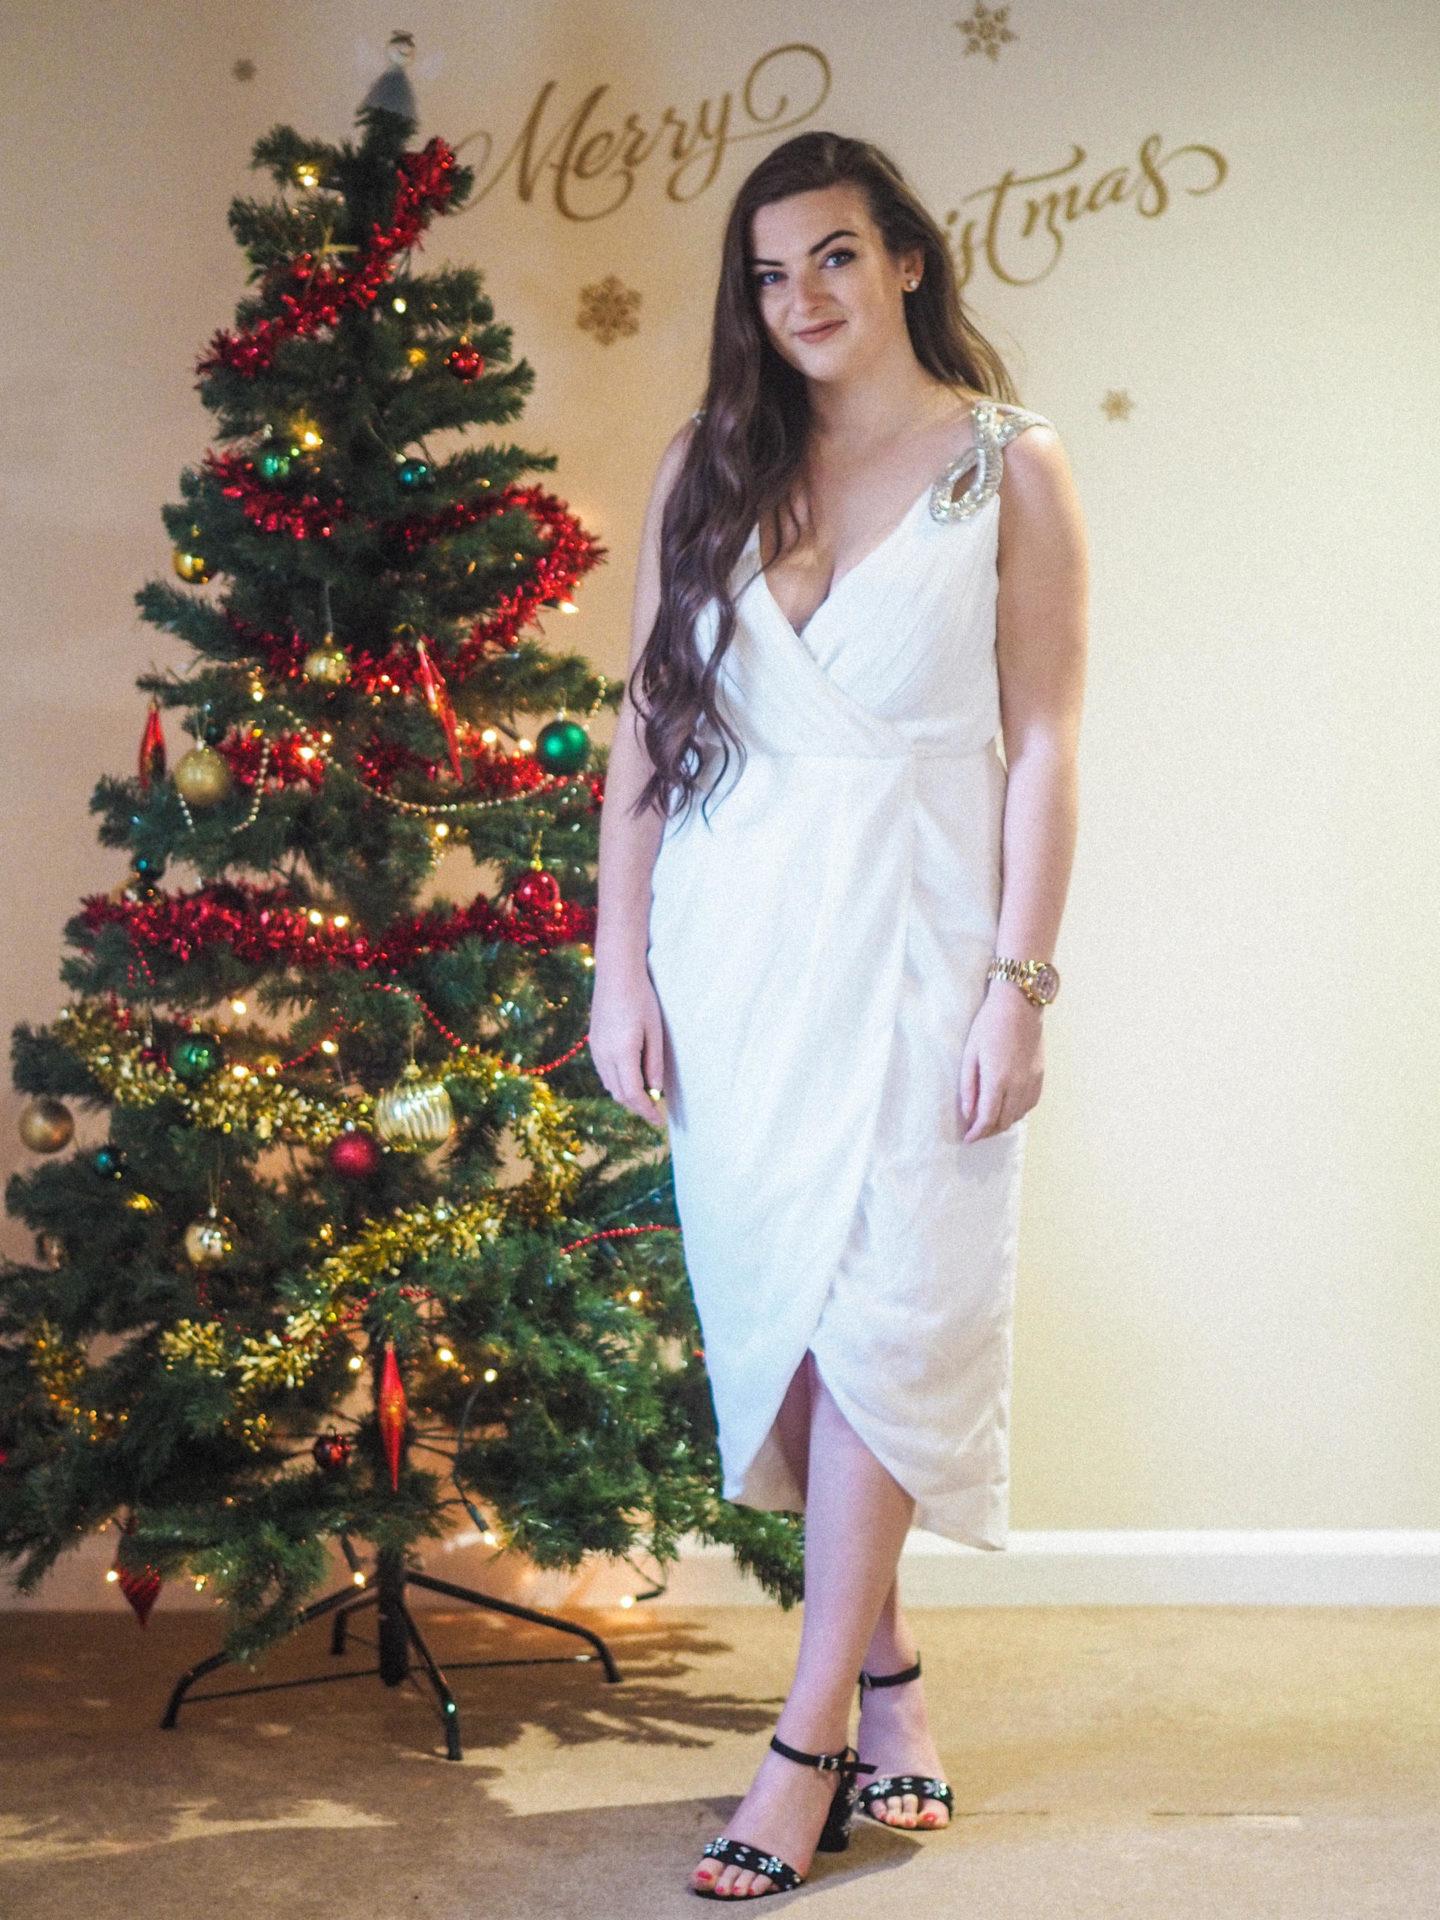 Dressing Up at Christmas with Studio.co.uk - Rachel Nicole UK Blogger